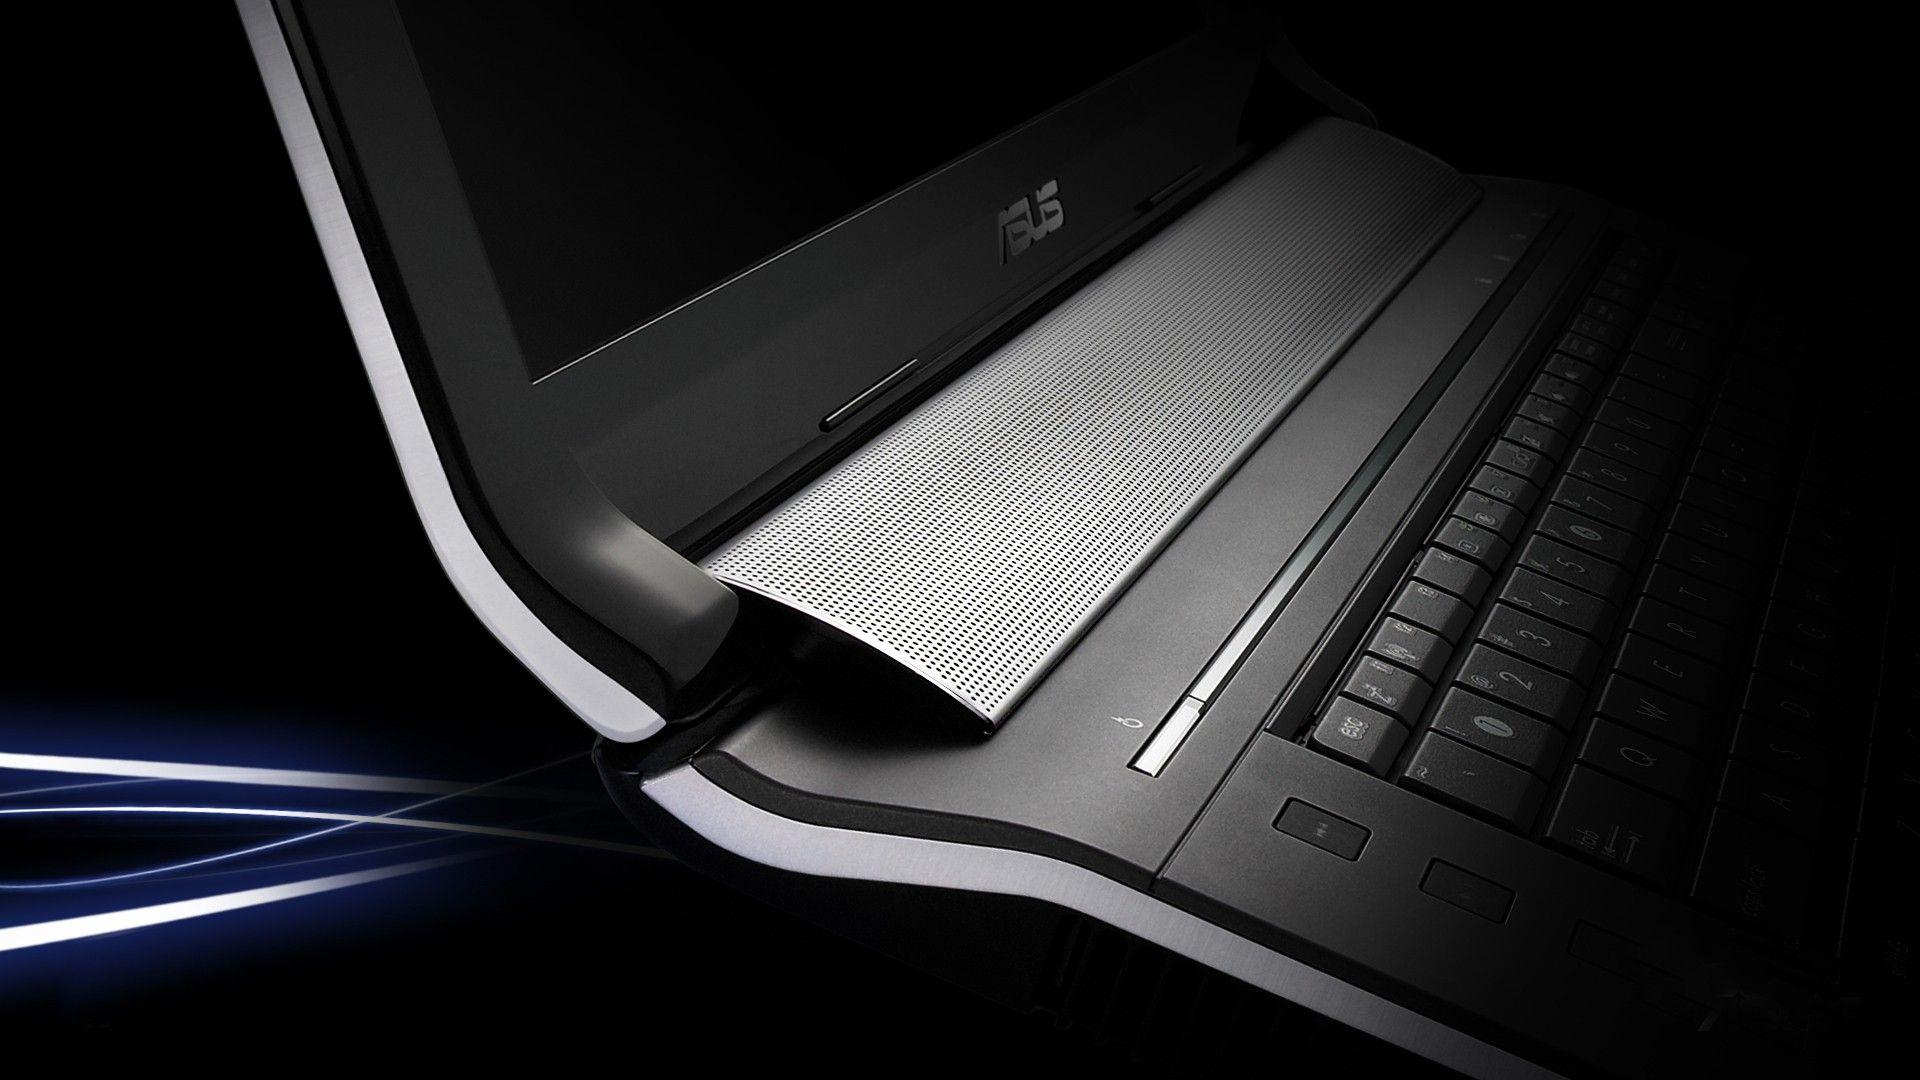 Laptop Backgrounds Hd Http Wallatar Com Wp Content Uploads 2015 02 Laptop Backgrounds Hd Jpg Http Wallatar Com L Asus Laptop Asus Online Computer Store